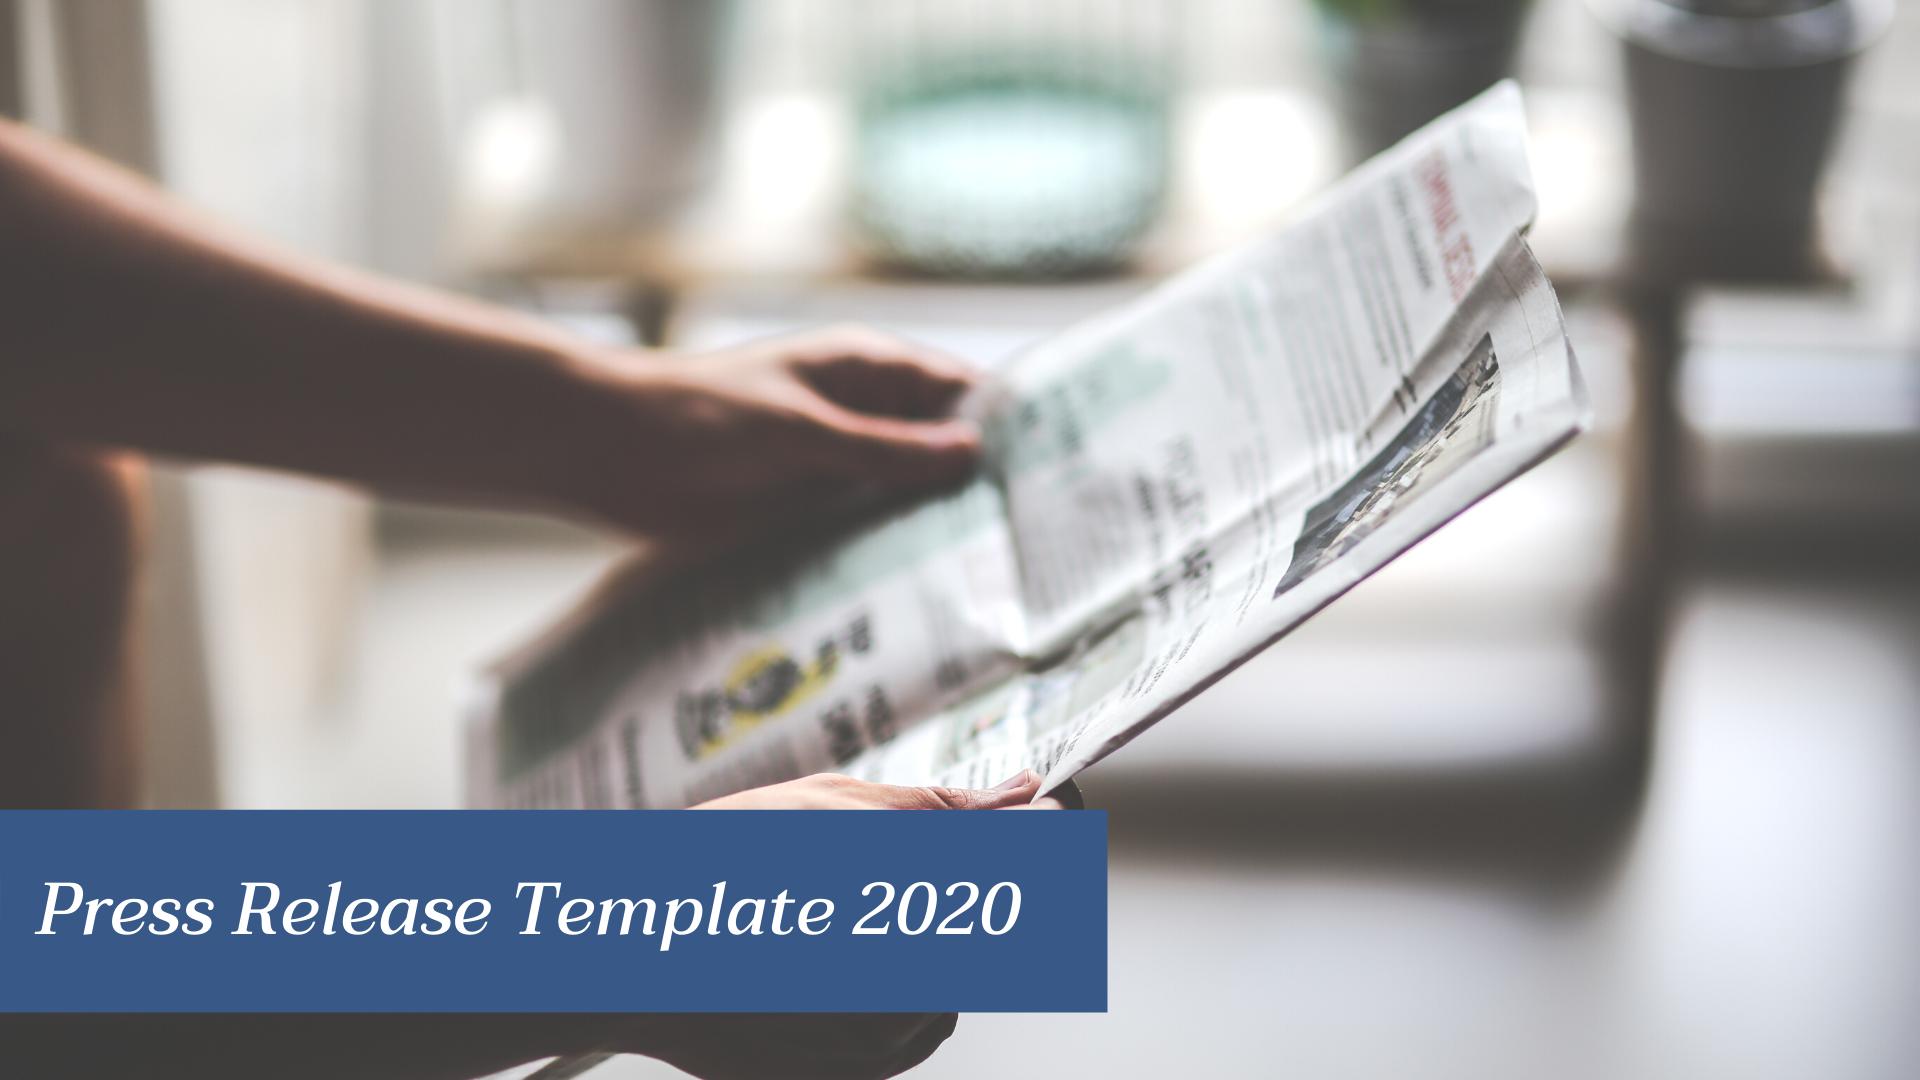 Press Release Template 2020